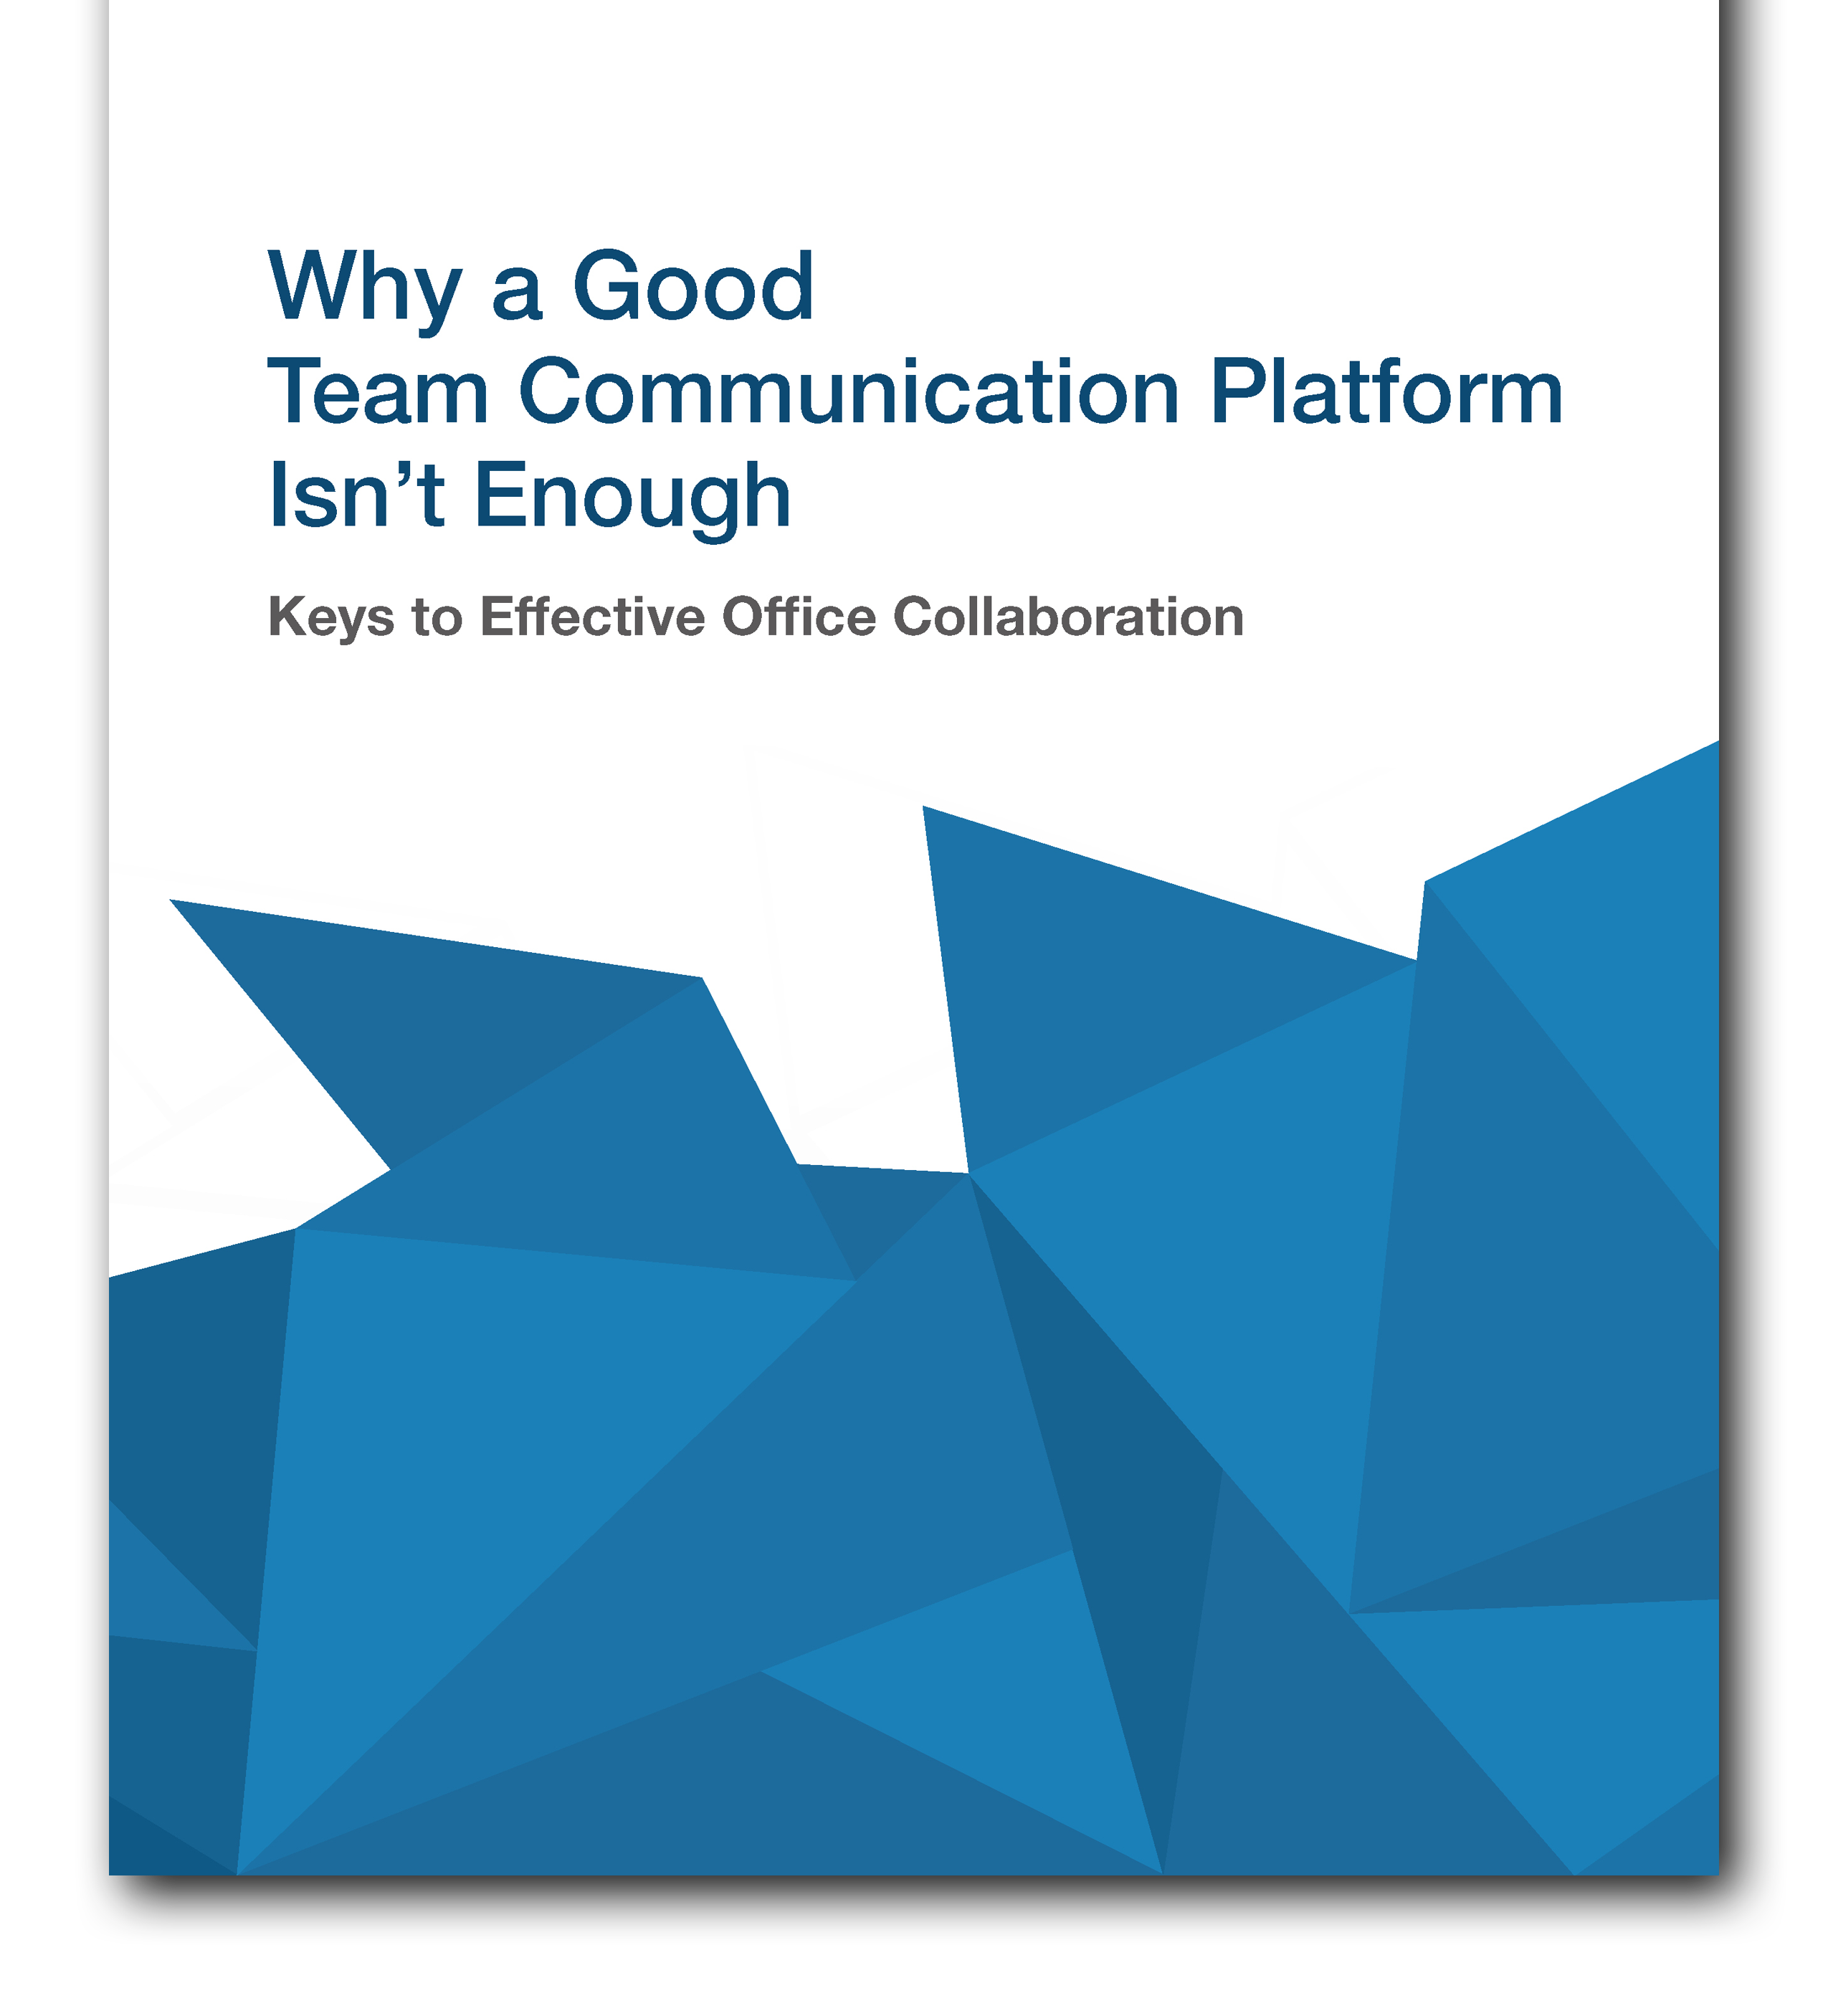 Why_a_Good_Team_Communication_Platform_Isnt-Enough_Whitepaper_3D_Cover-no-SG-logo